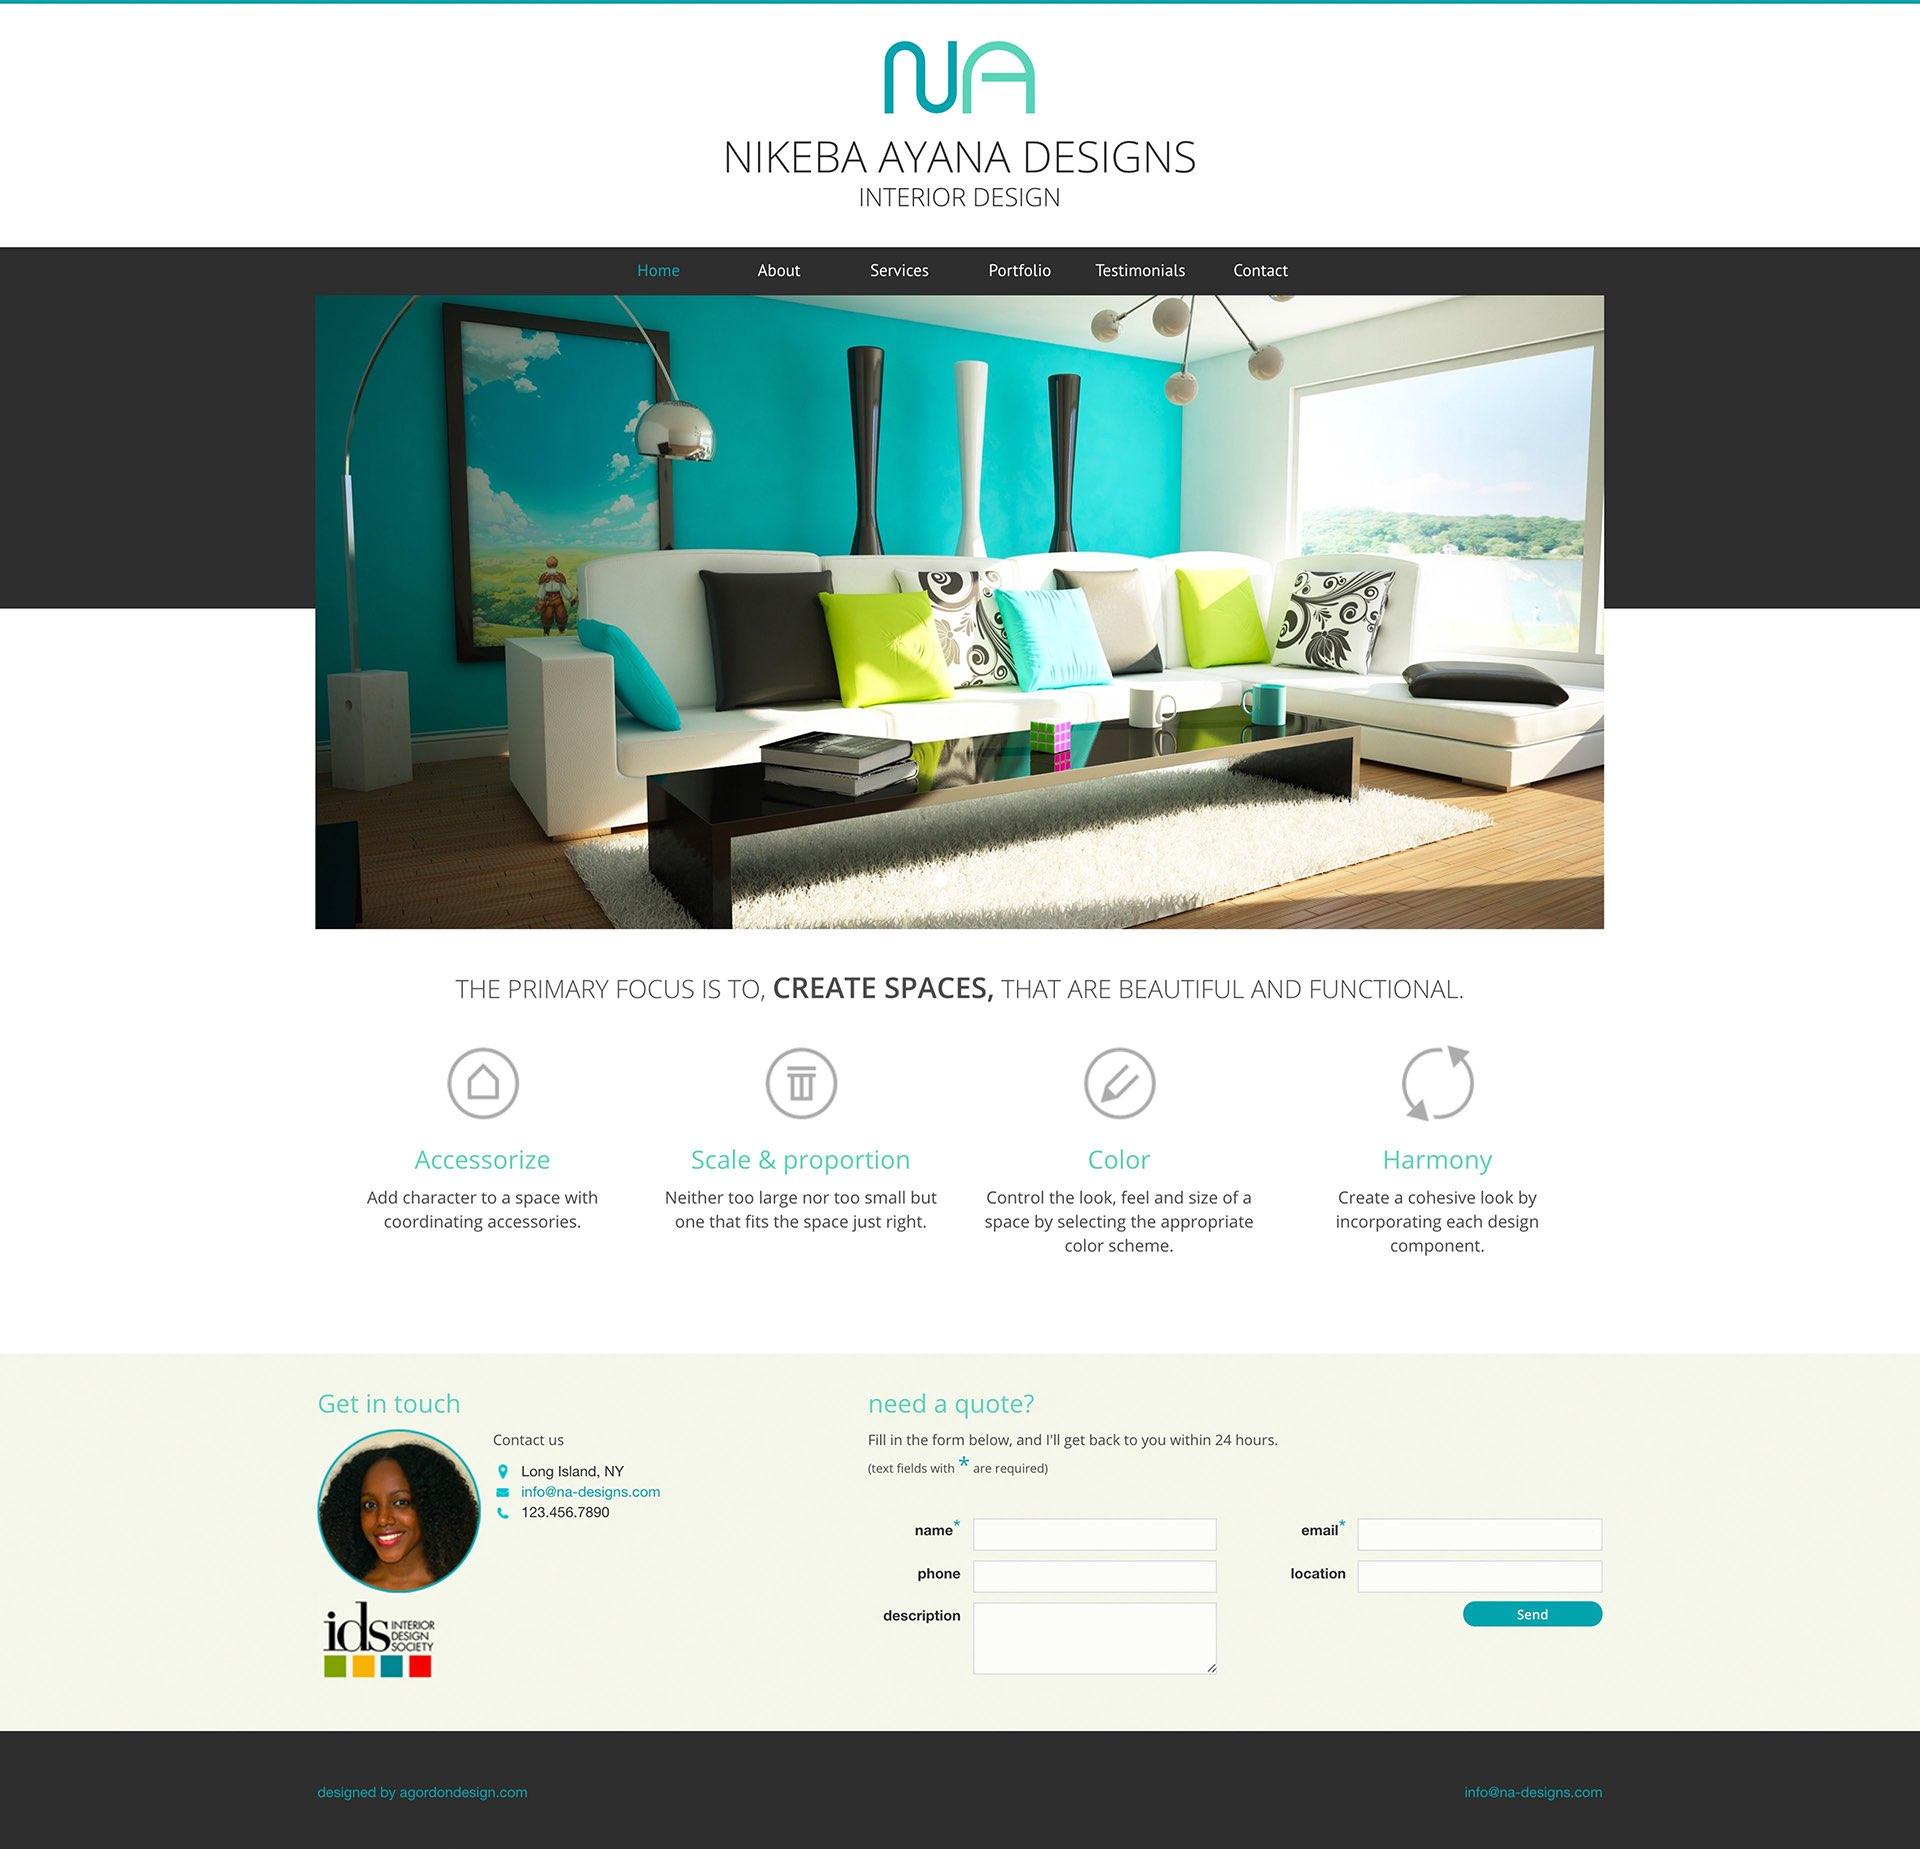 59 interior design online freelance online interior for Interior design recruitment agencies manchester